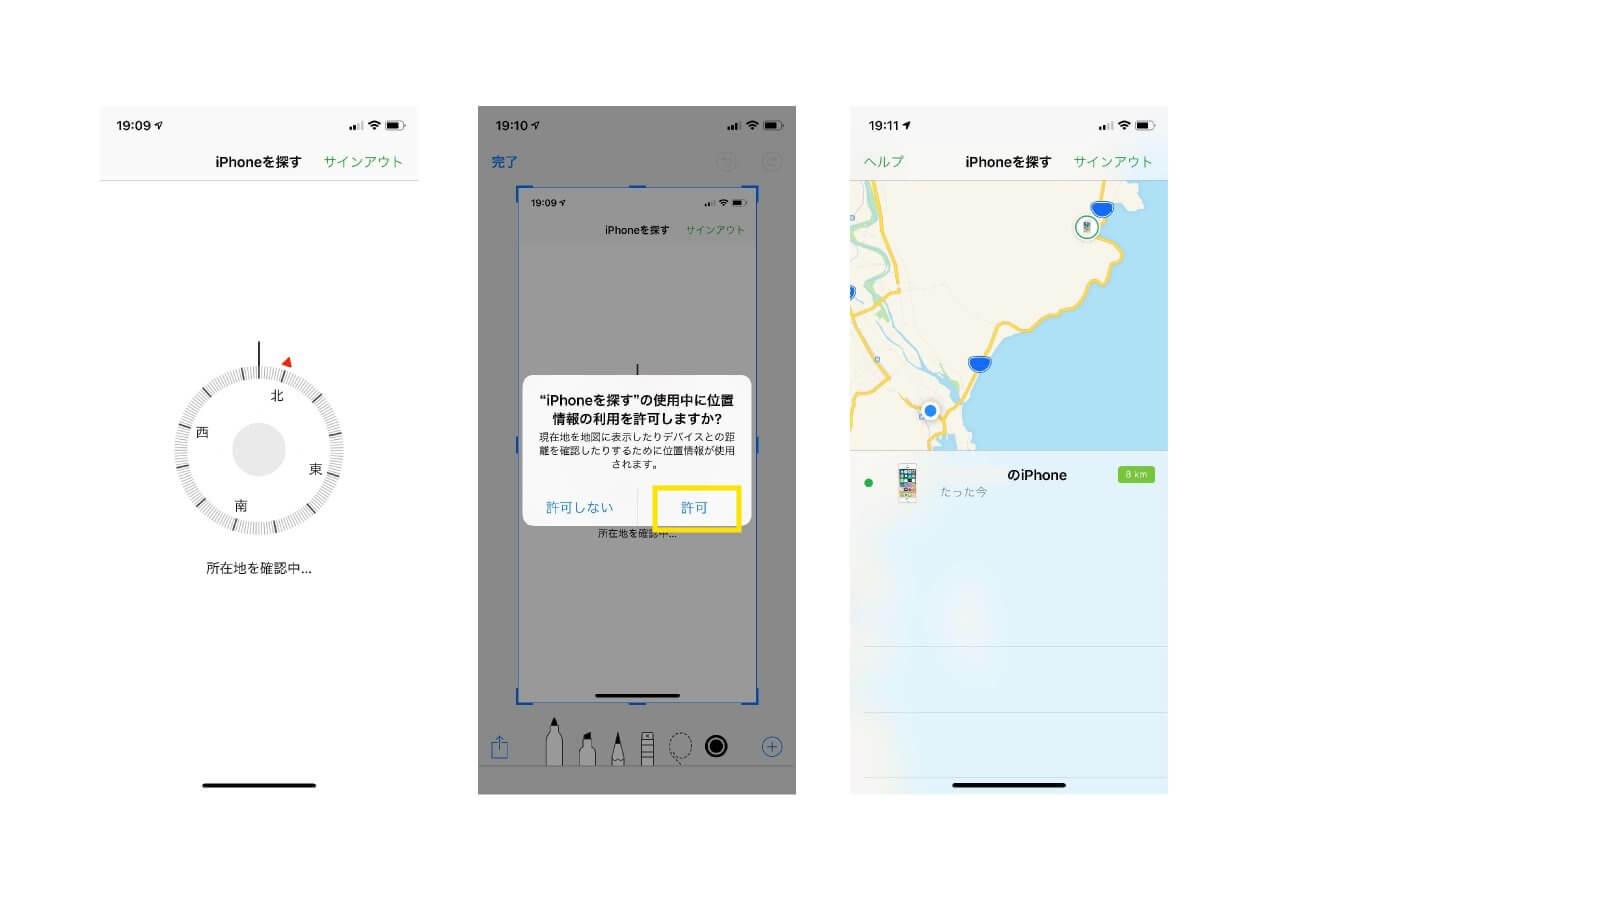 iphone操作方法。「iphoneを探す」機能を実際に使ってみる。